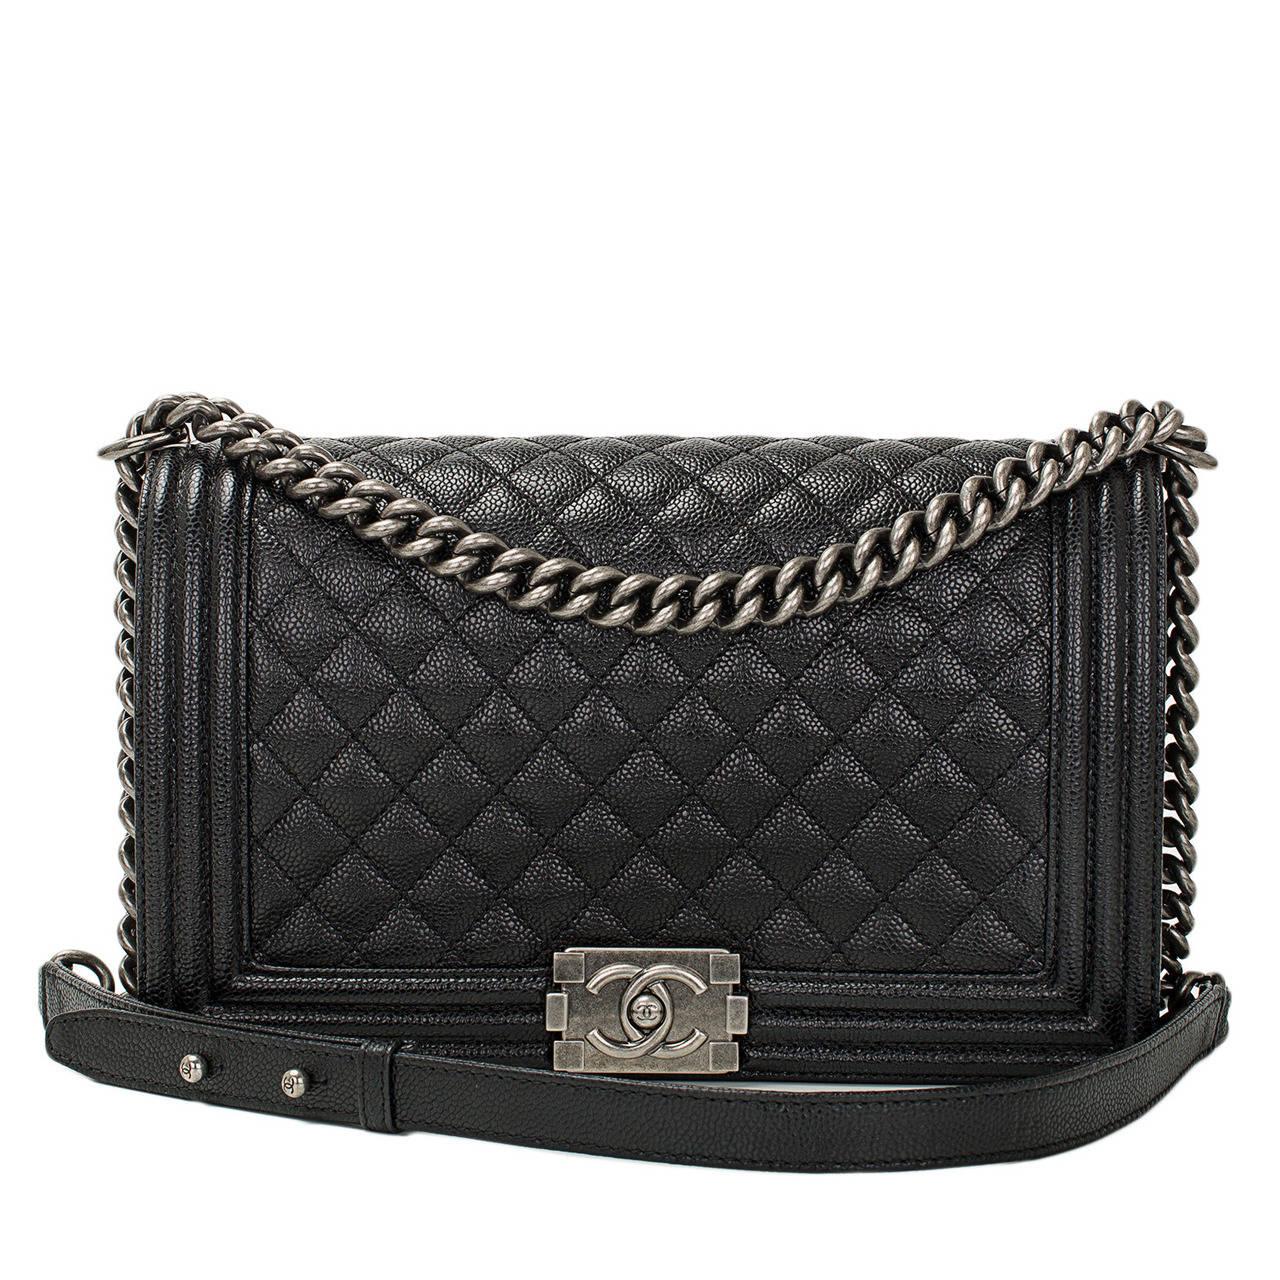 Chanel Black Caviar New Medium Boy Bag